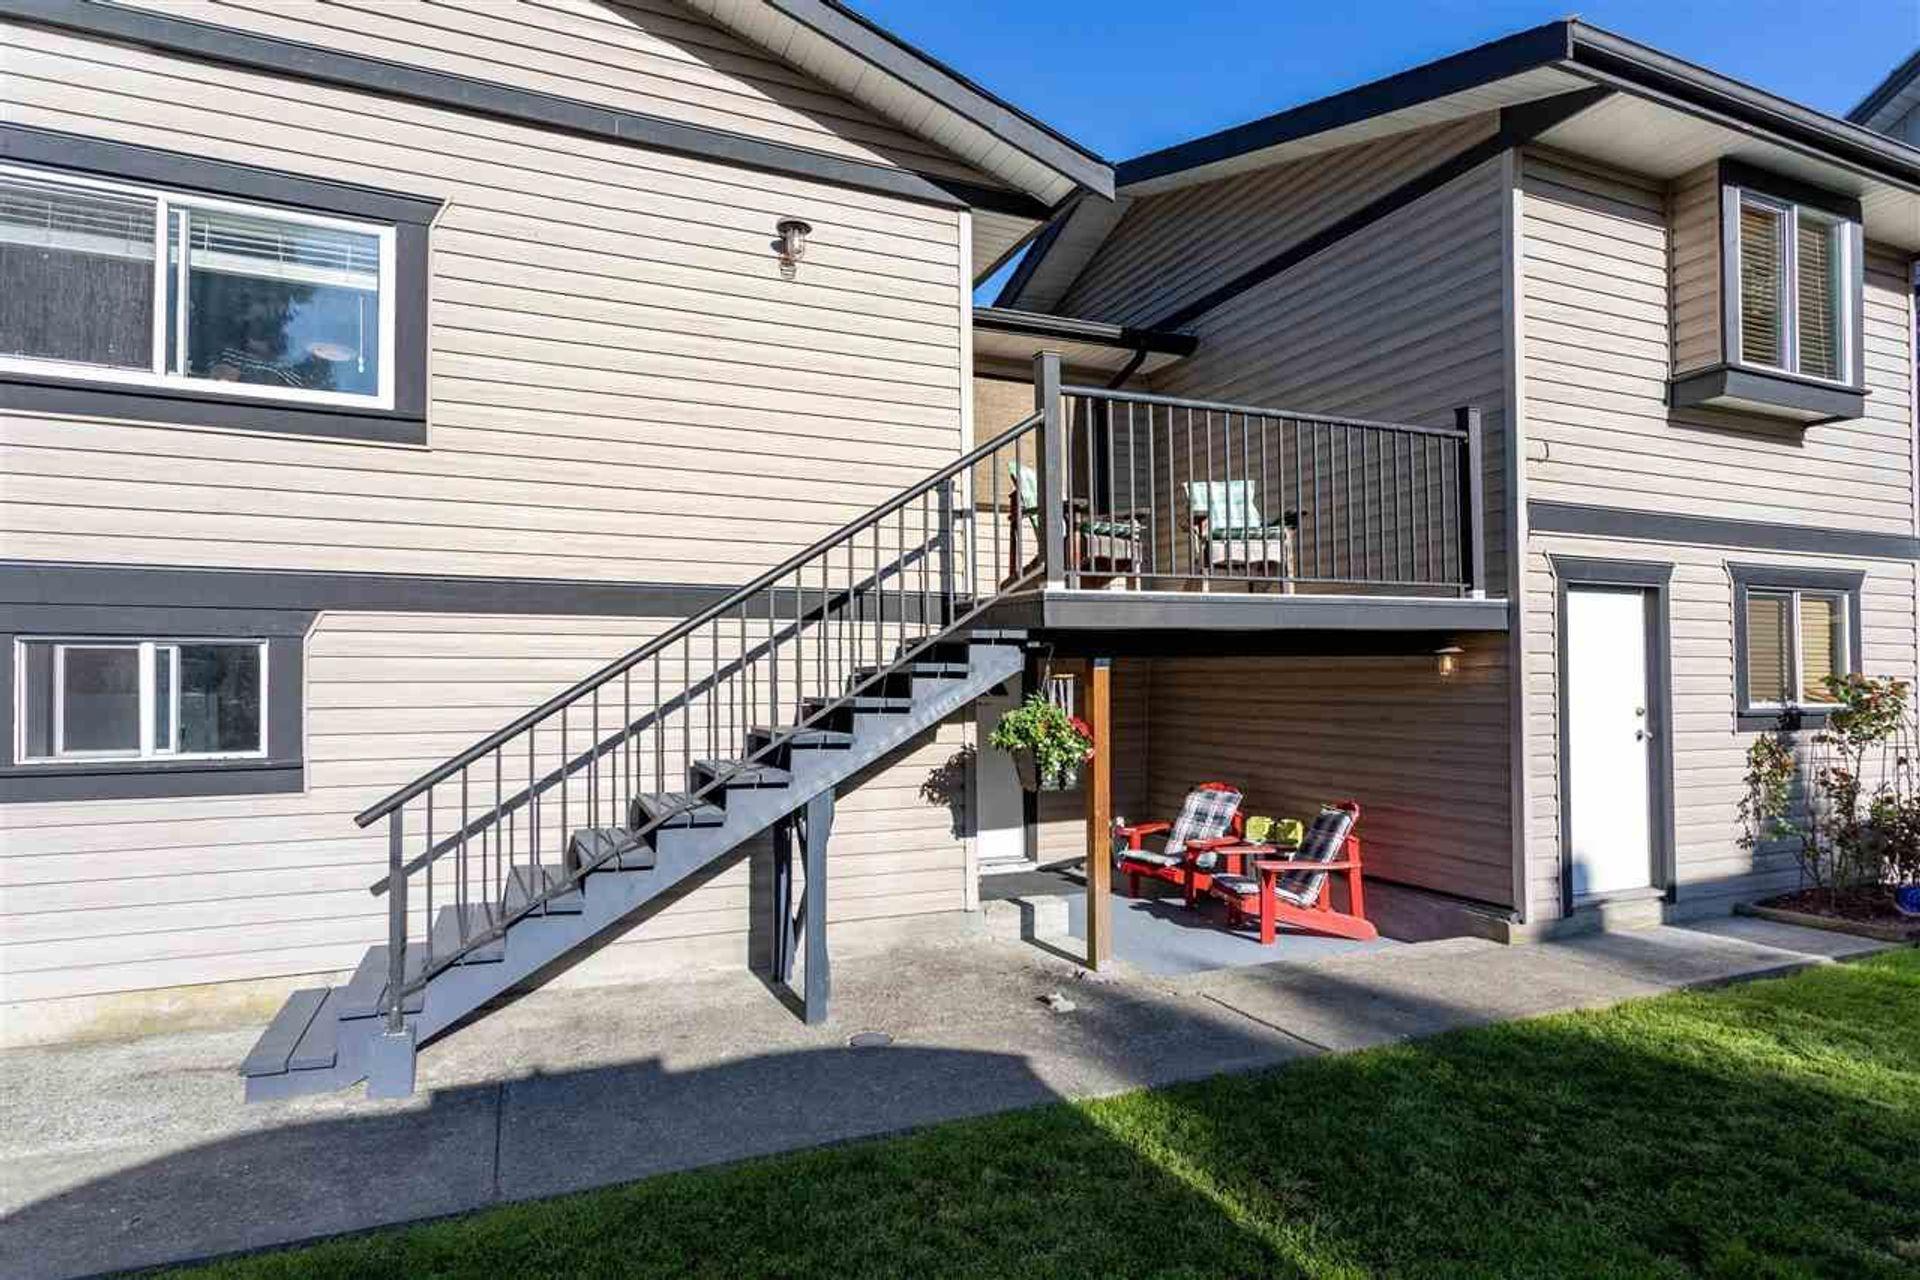 728-blue-mountain-street-coquitlam-west-coquitlam-19 at 728 Blue Mountain Street, Coquitlam West, Coquitlam